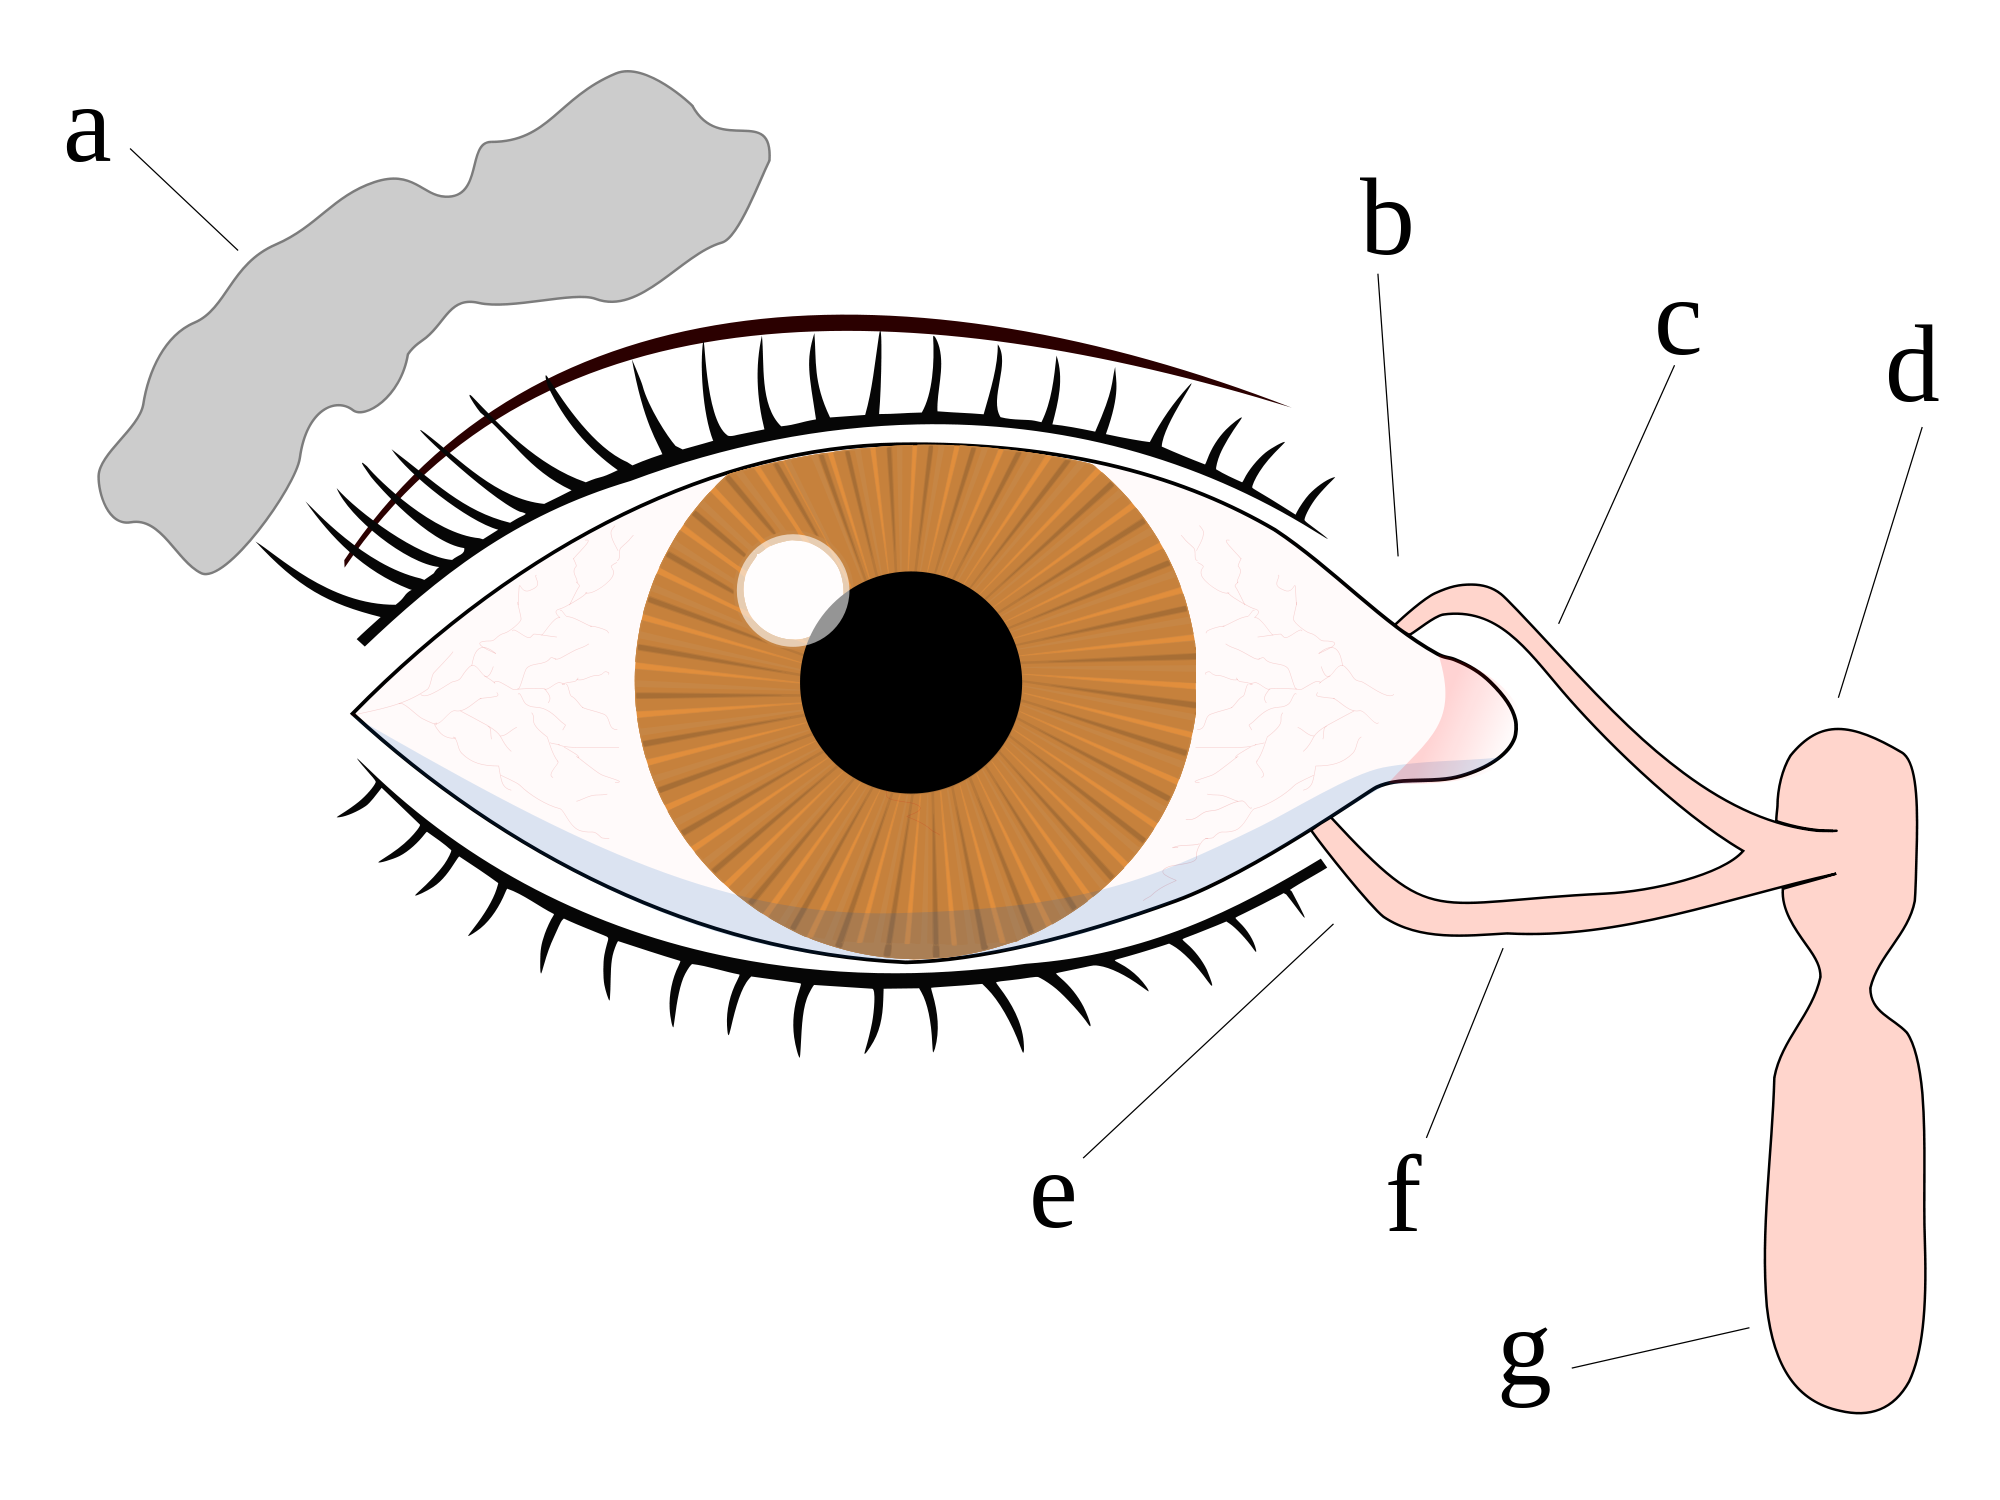 Tears wikipedia. Eyeball clipart eye surgery